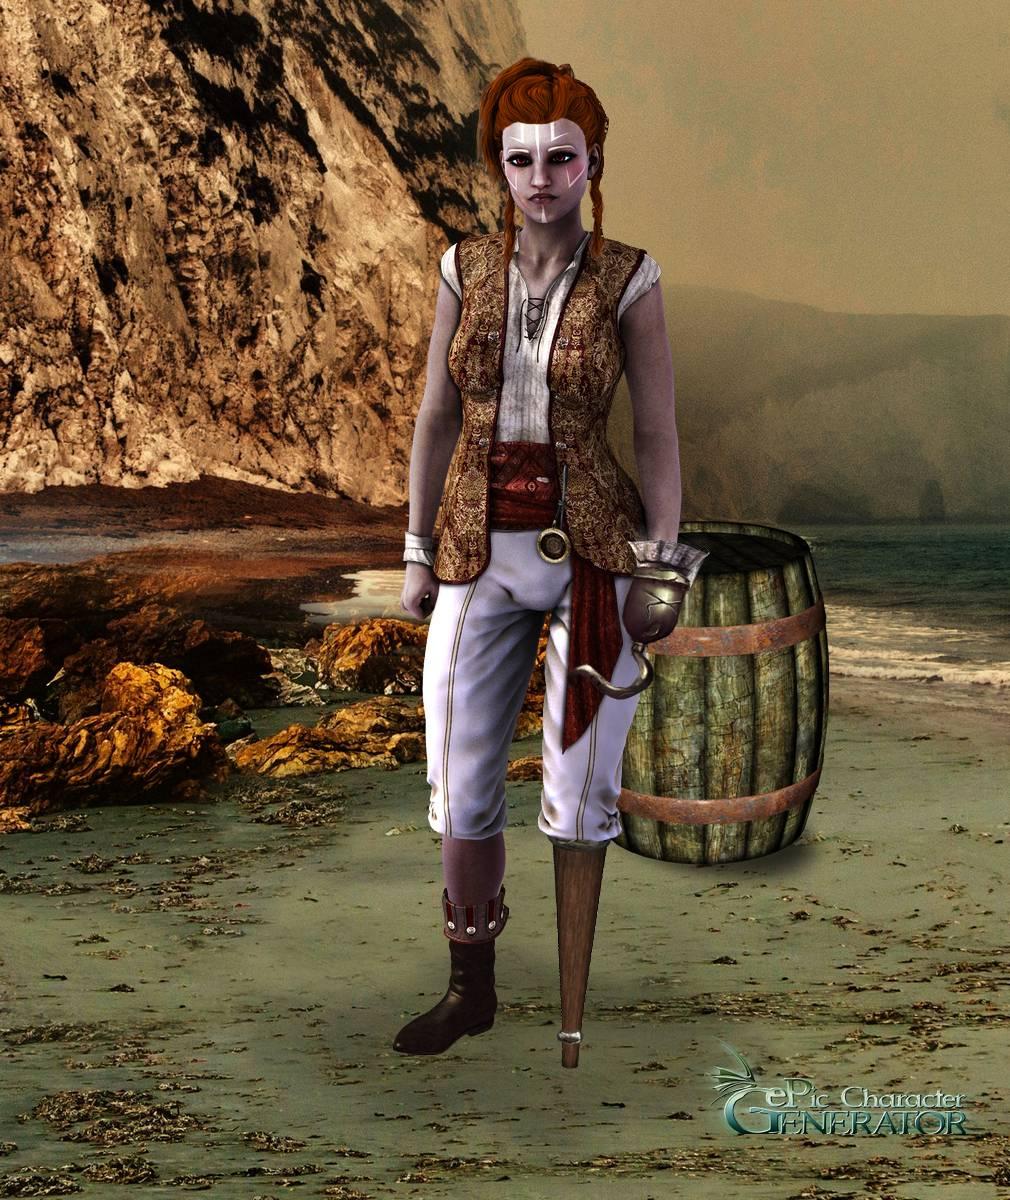 ePic Character Generator Season 2 Female Pirate Screenshot 04